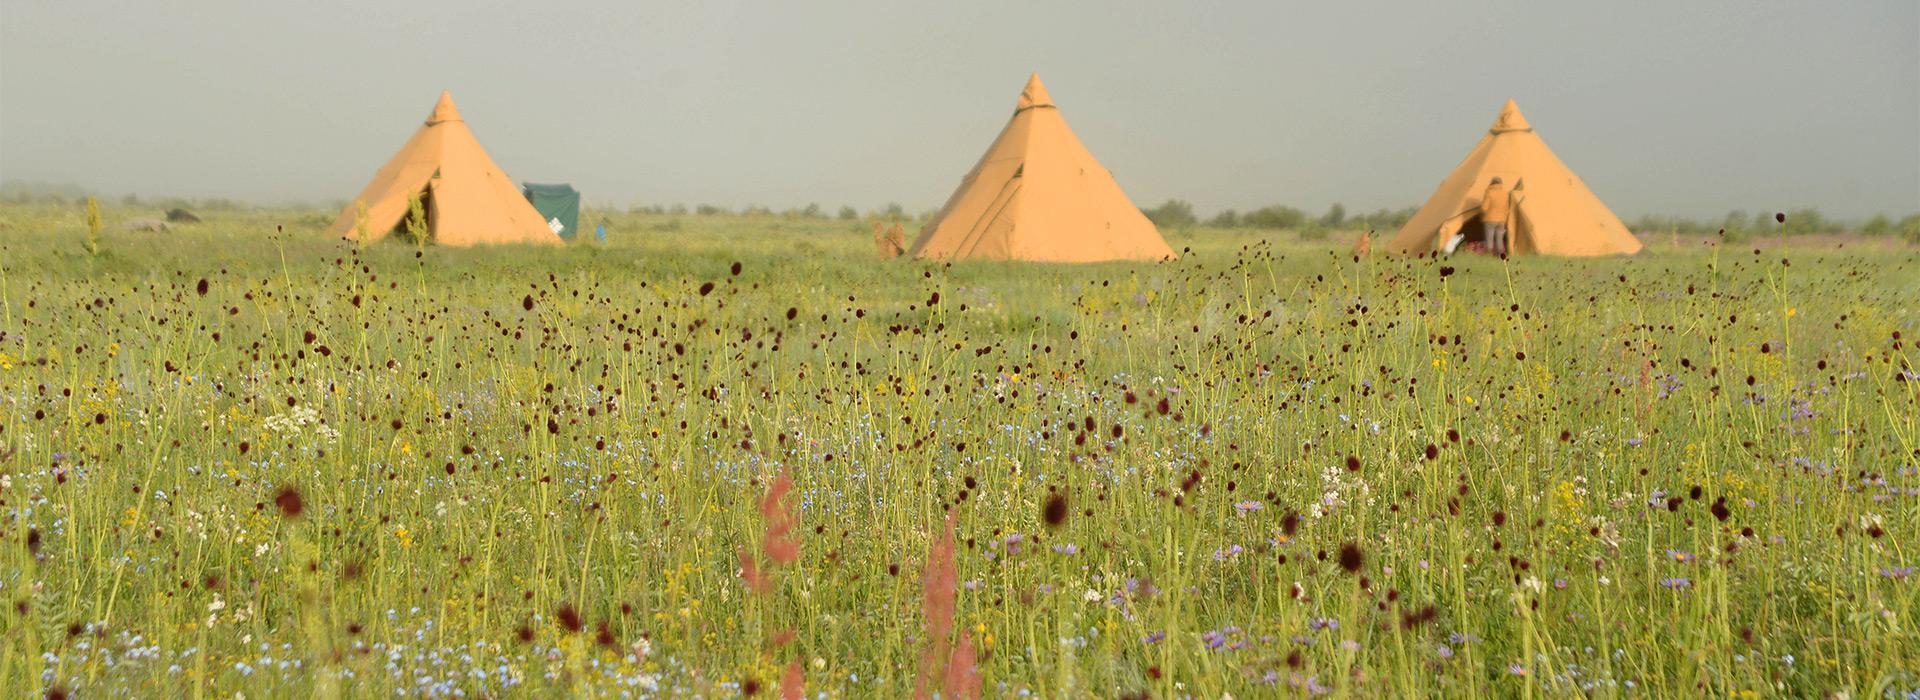 mongolian-grassland-with-tentipi